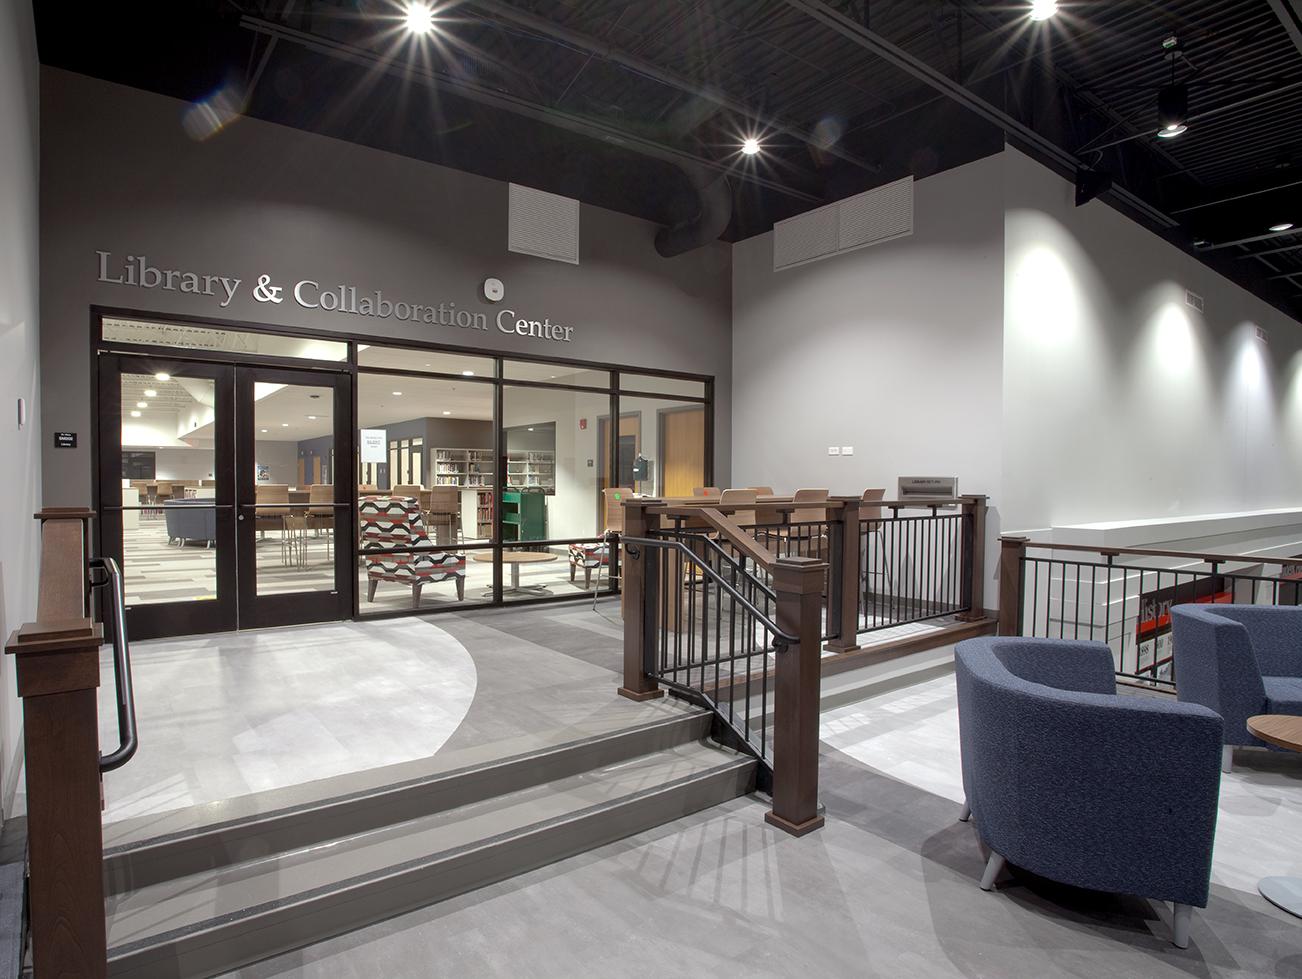 benet-academy-library-entrance-lo